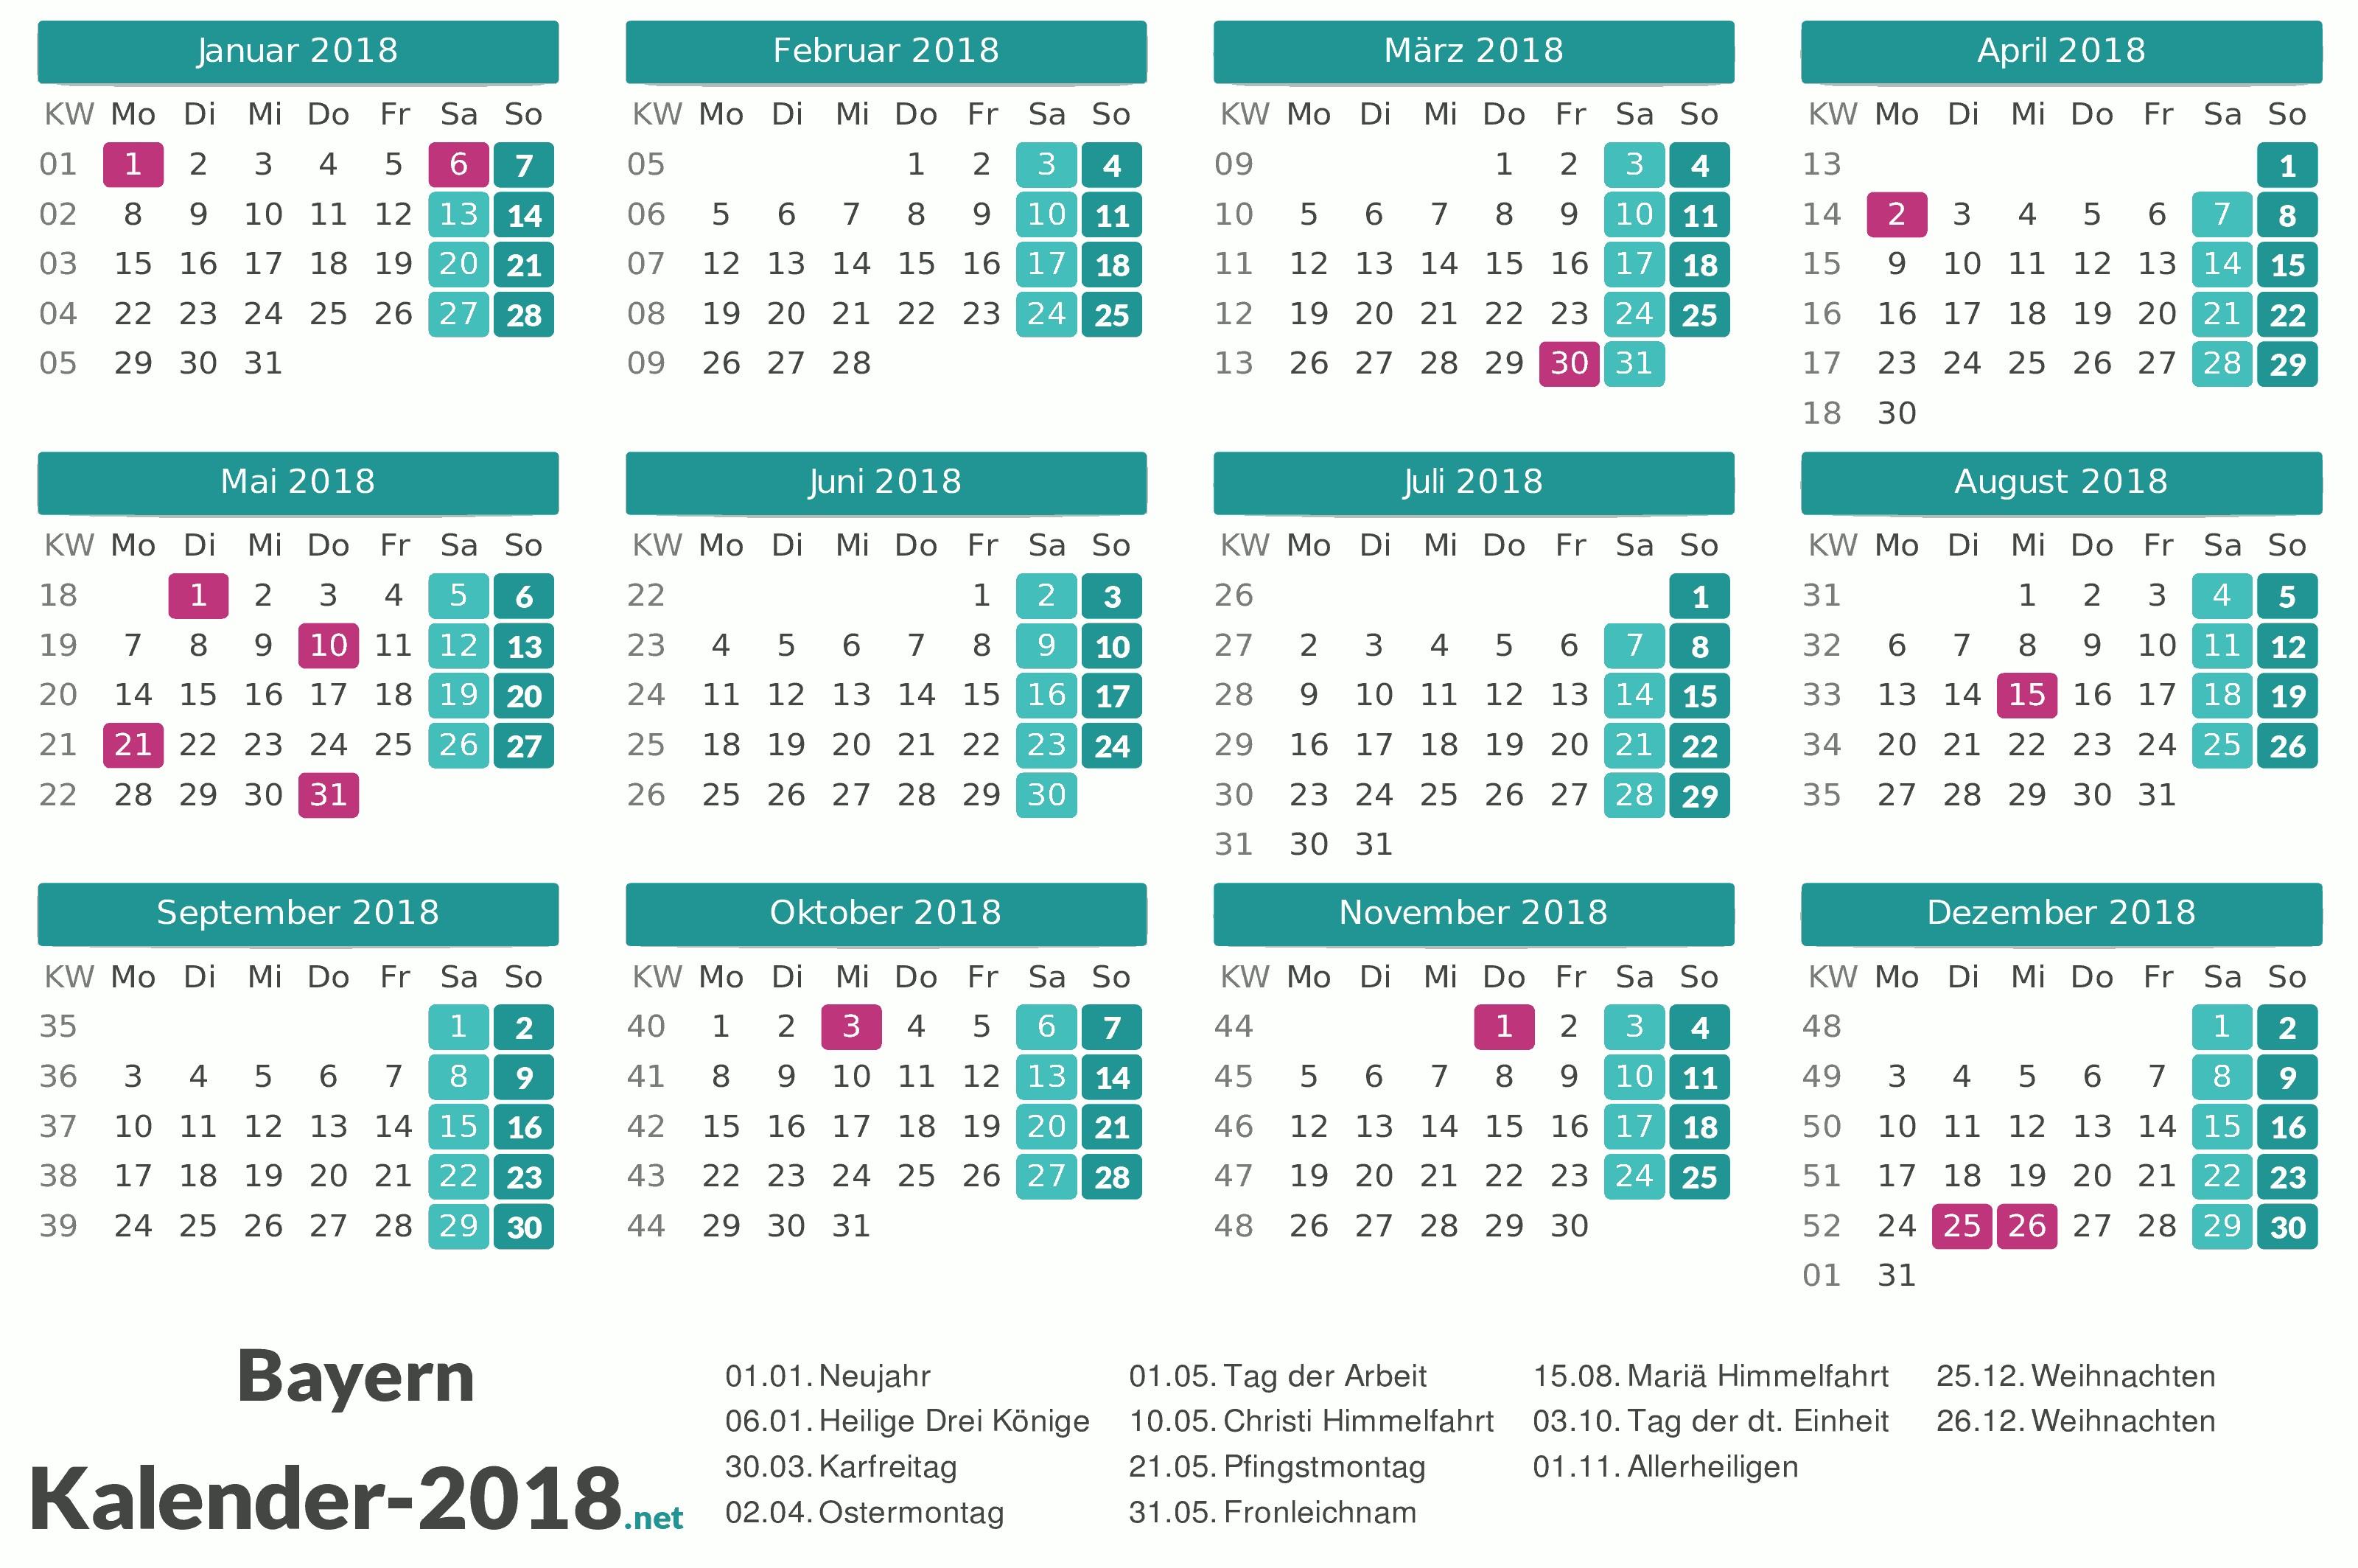 Bayern Kalender 2018 Feiertage